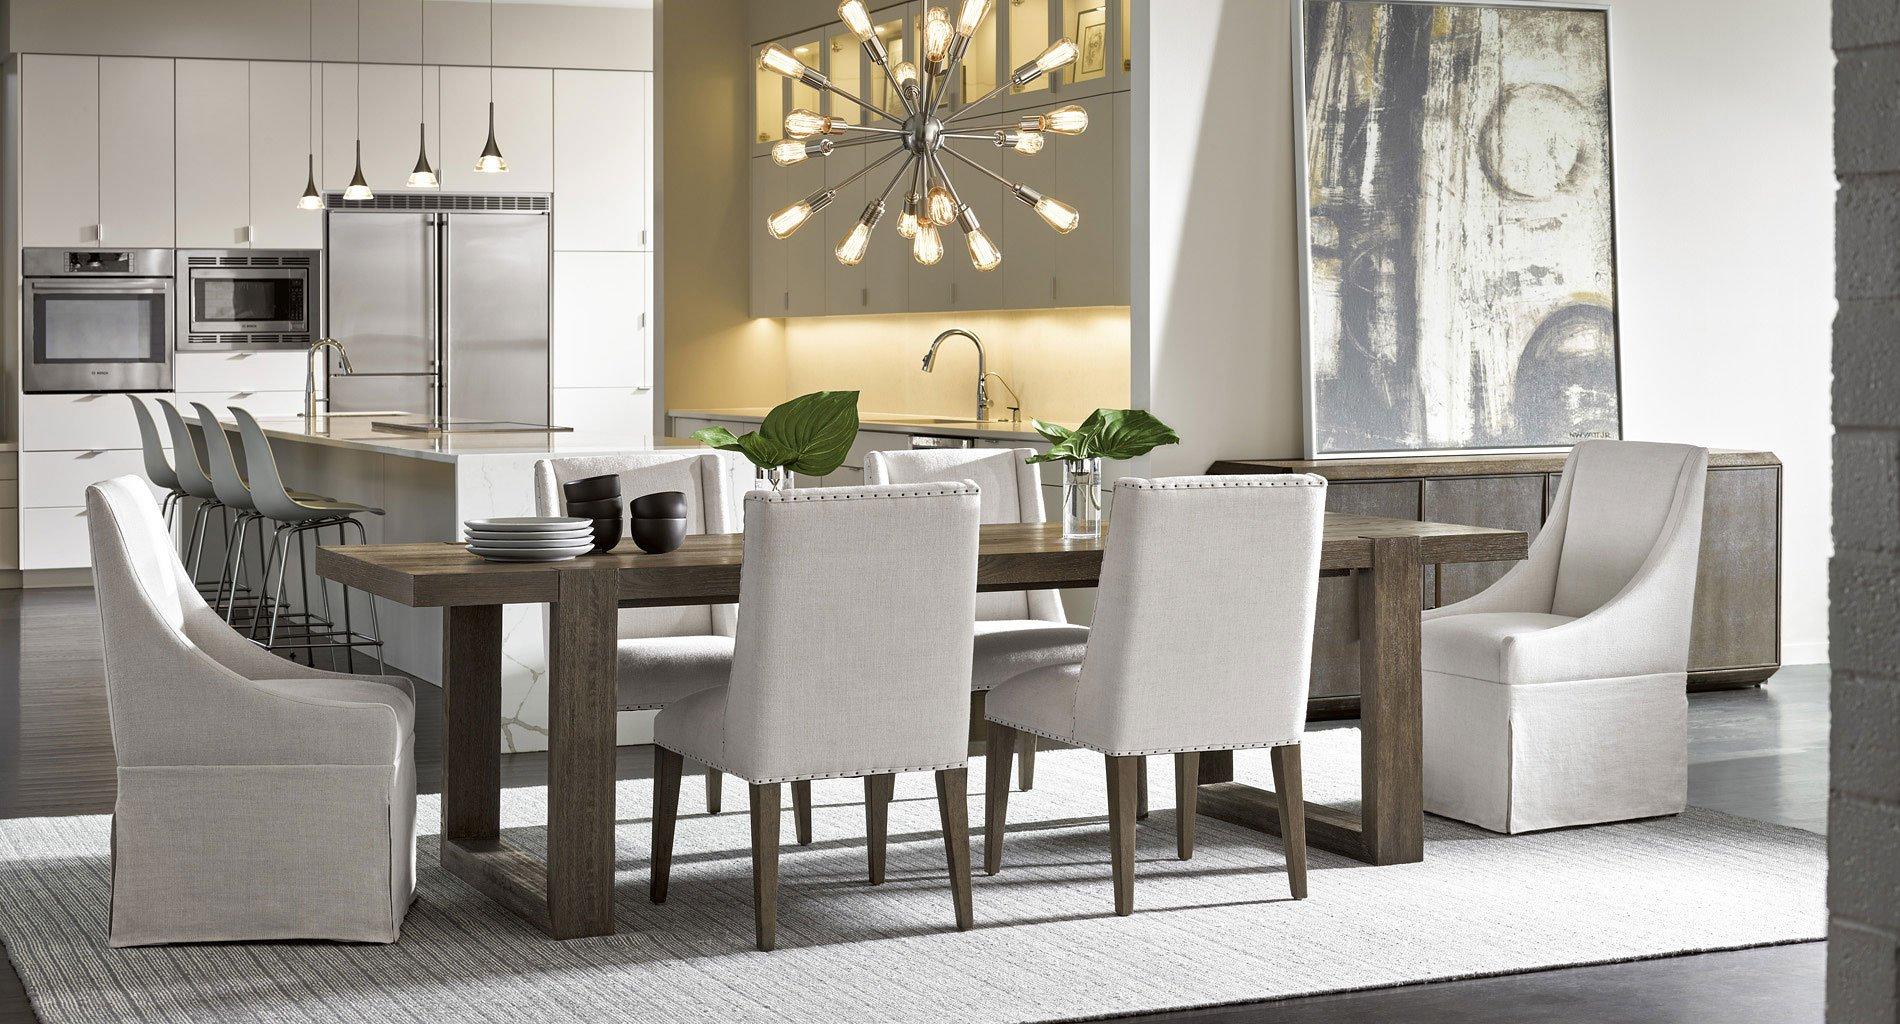 Flint Office Furniture: Modern Desmond Dining Room Set (Portobello) W/ Flint Chair